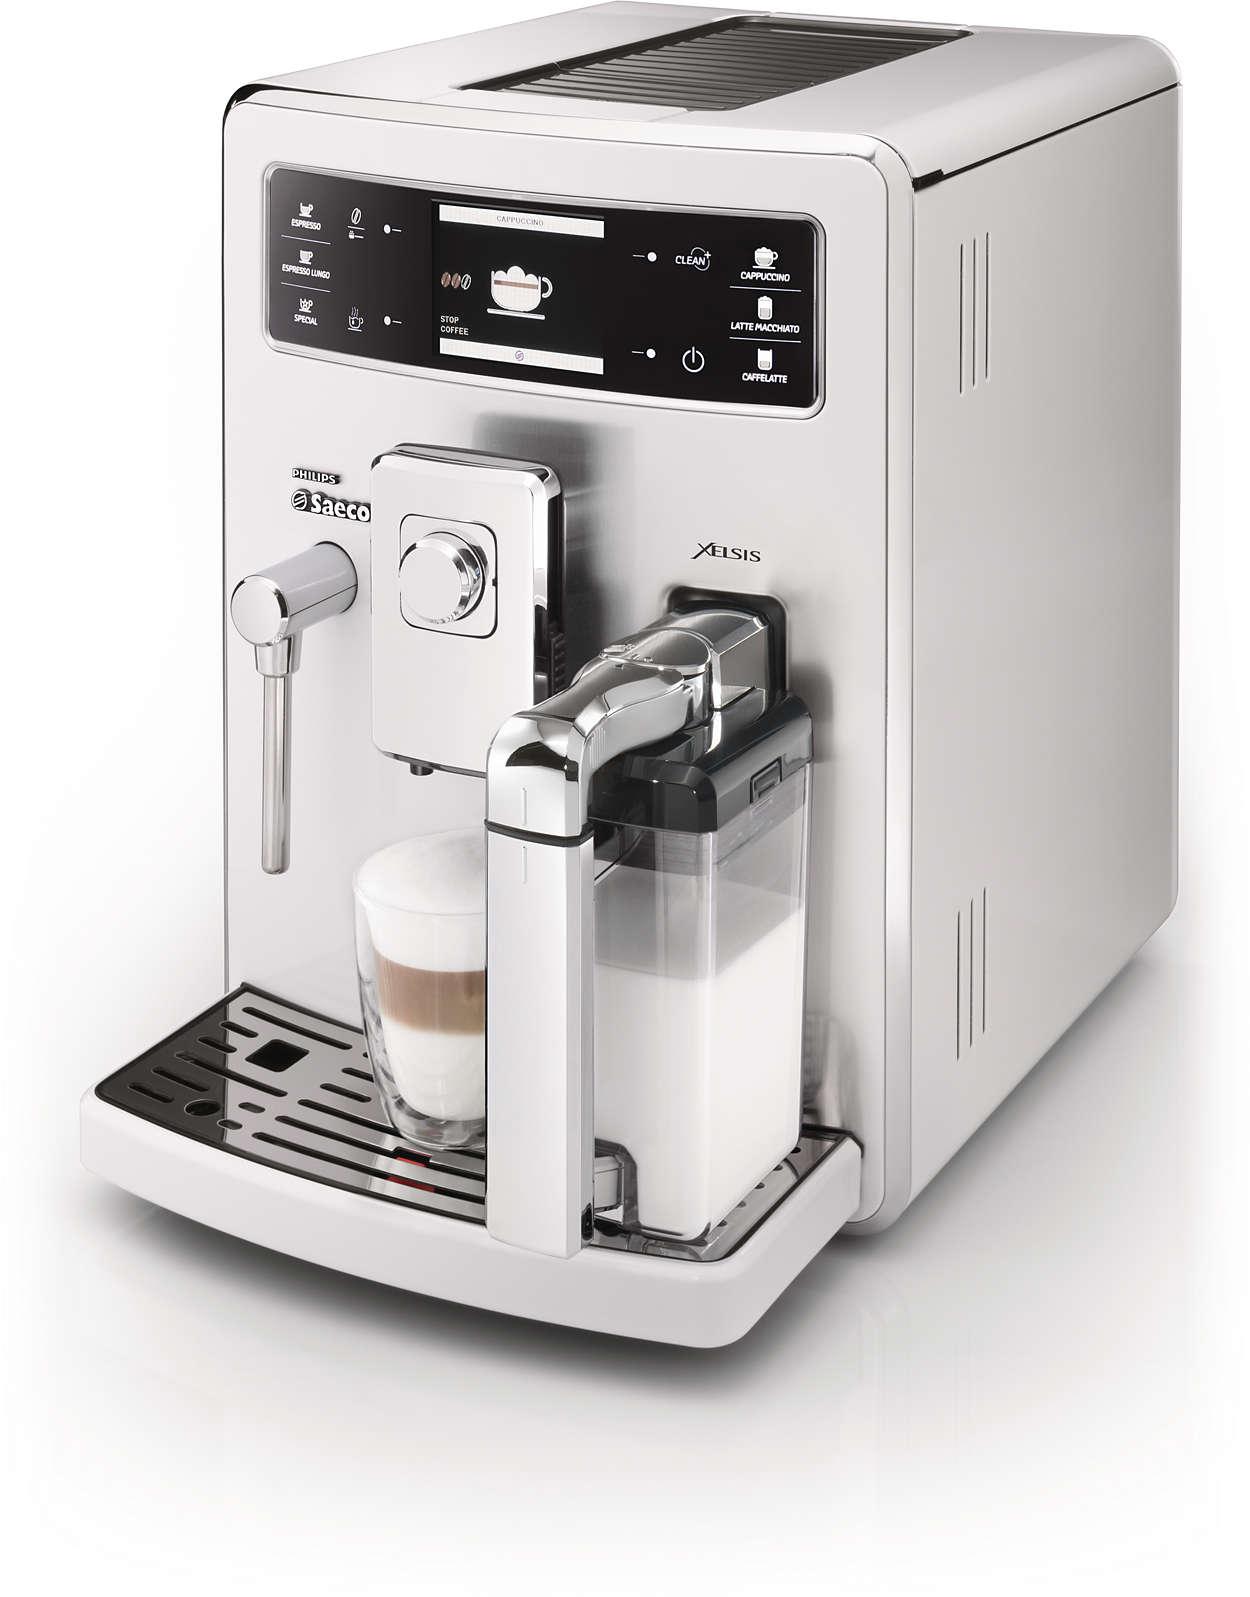 xelsis w pe ni automatyczny ekspres do kawy hd8943 29 saeco. Black Bedroom Furniture Sets. Home Design Ideas